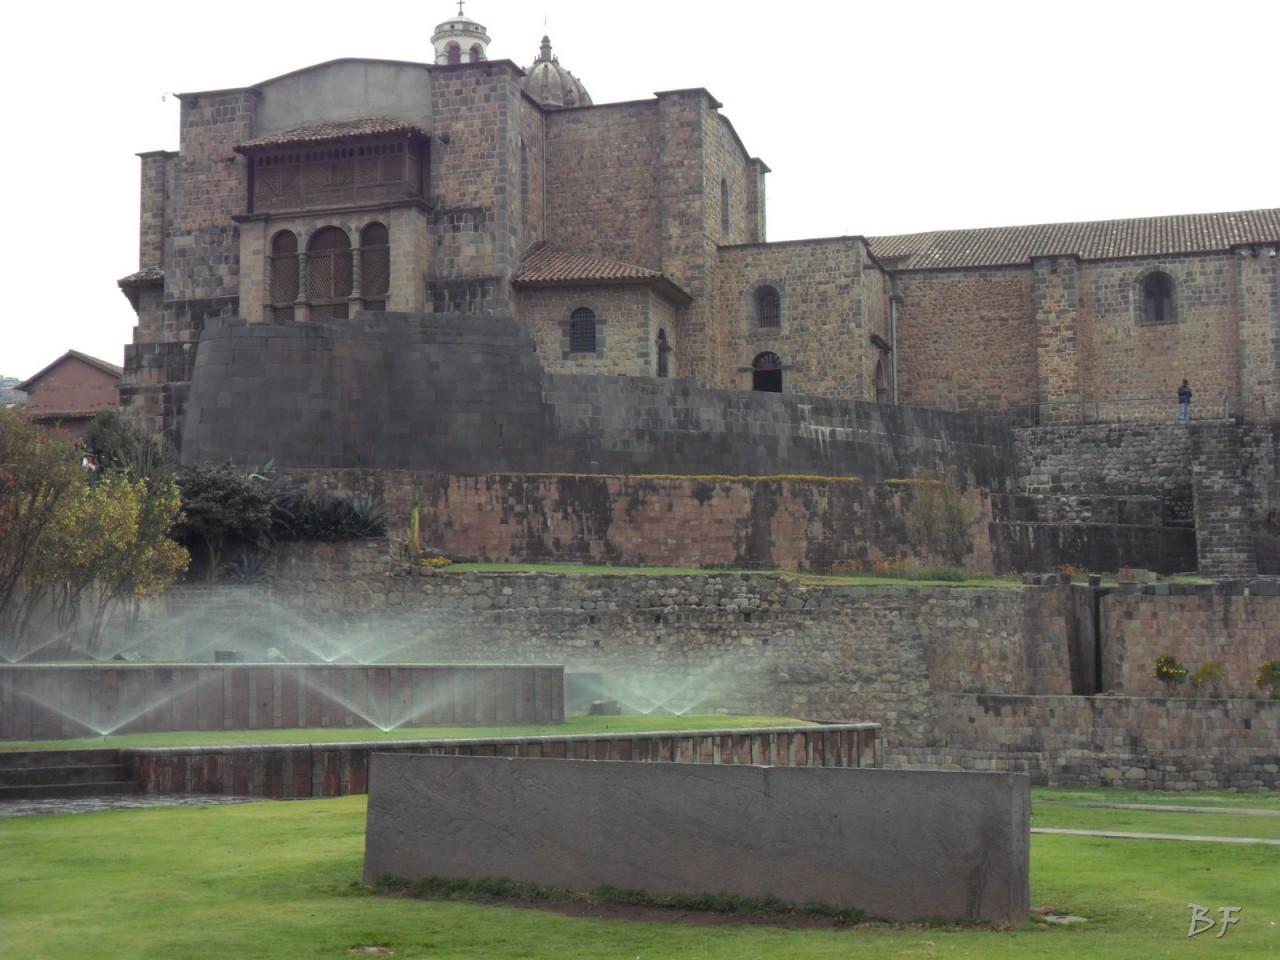 Mura-Poligonali-Megaliti-Tempio-Coricancha-Cusco-Perù-62